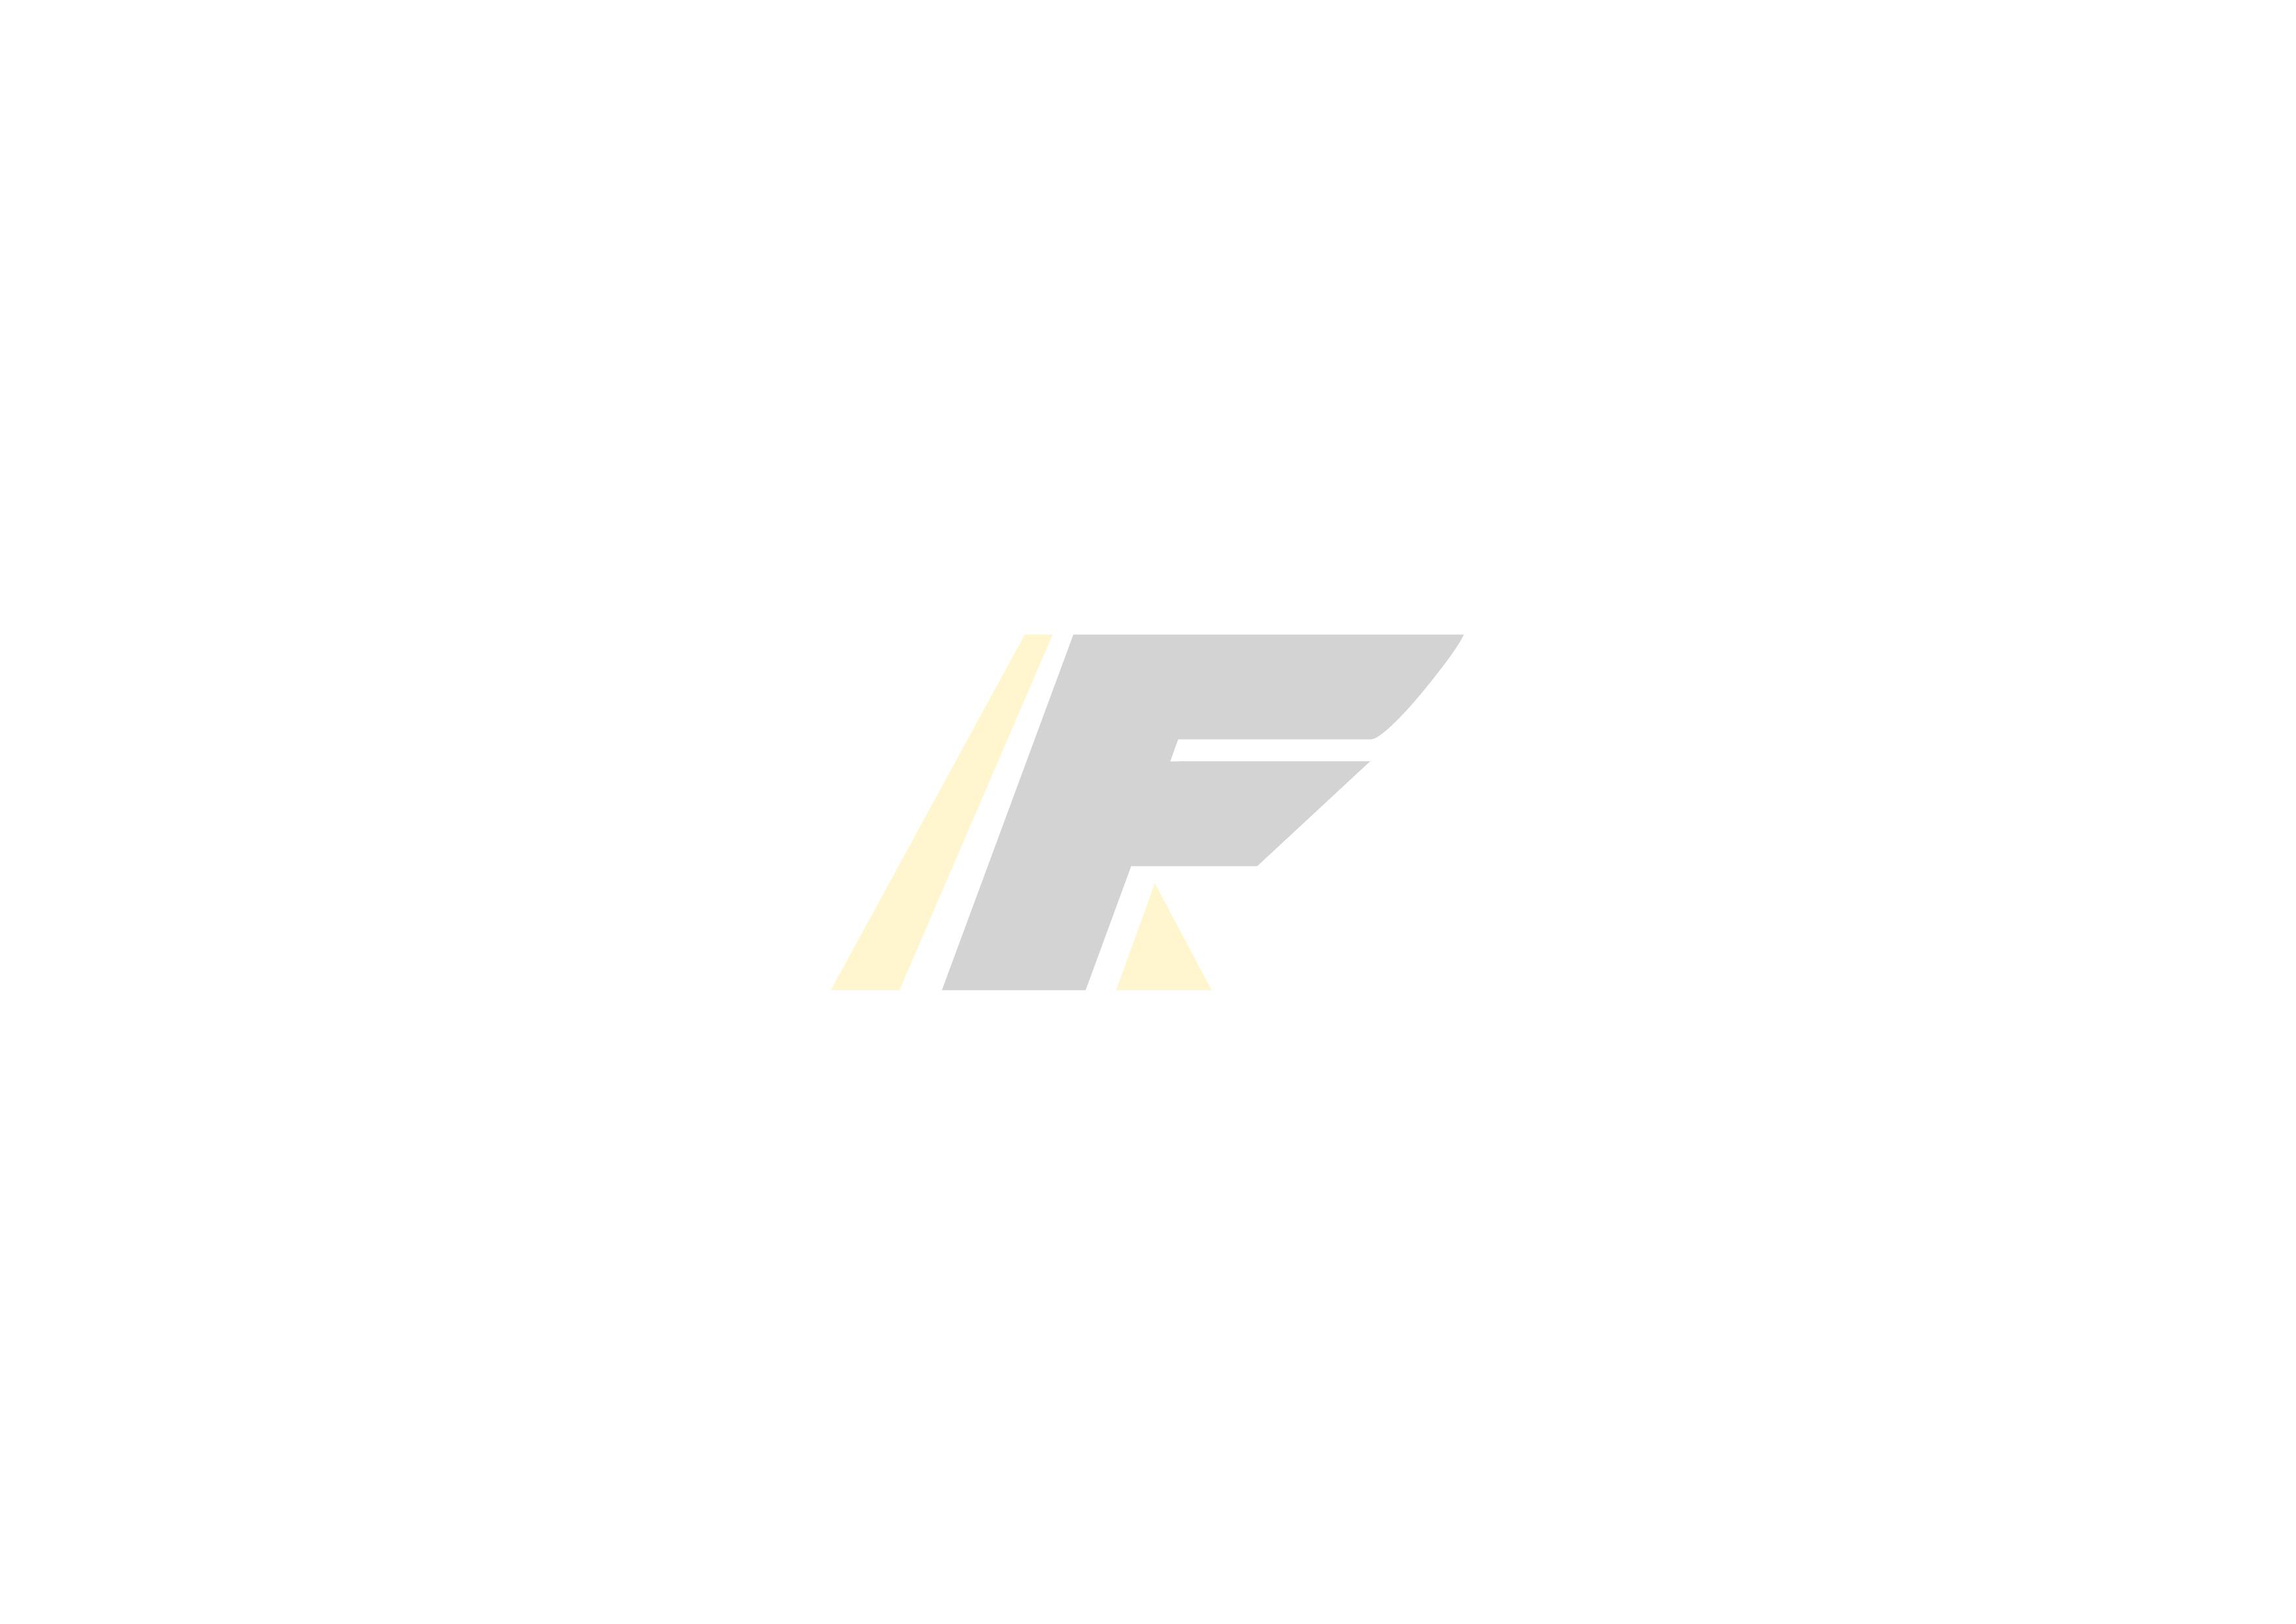 Ficeda Accessories Tb1215 250 Threebond 1215 Gearbox Sealant Grey